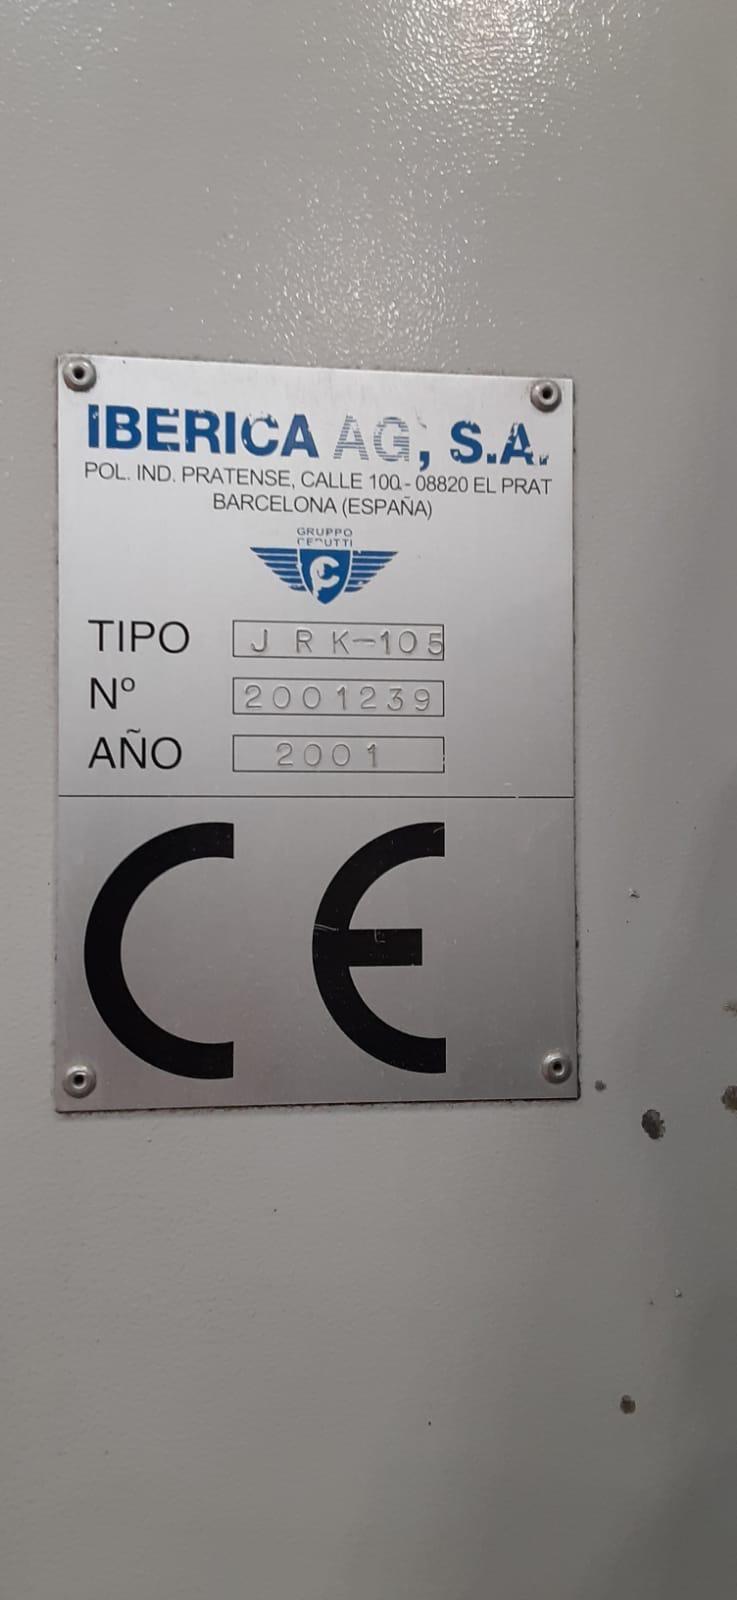 IBERICA JRK-105